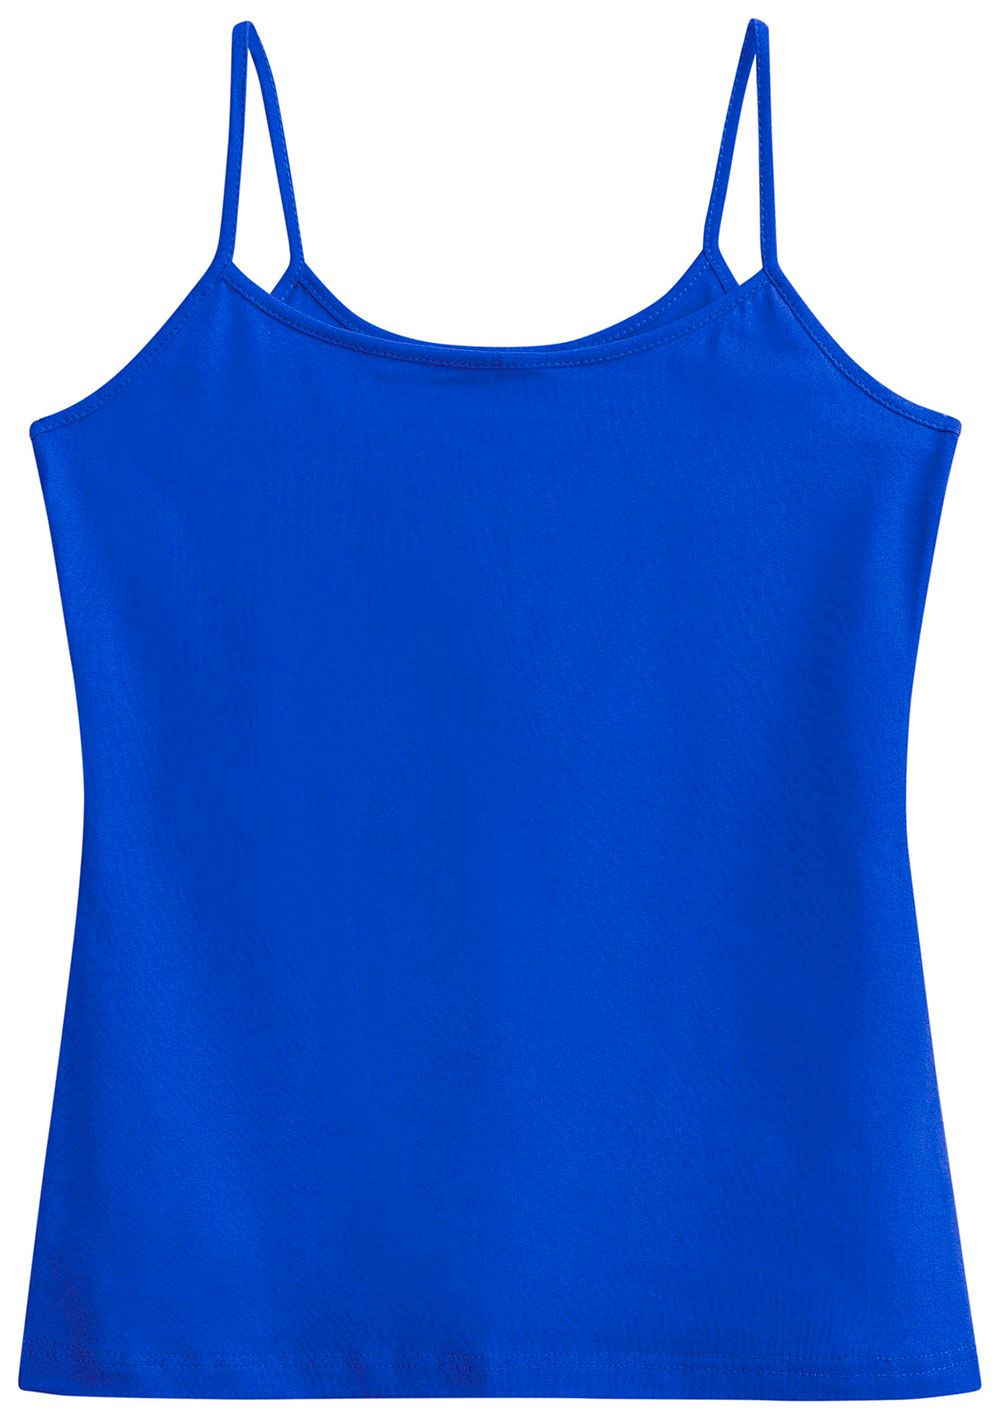 Blusa ADULTO Feminina Verão Azul Malwee